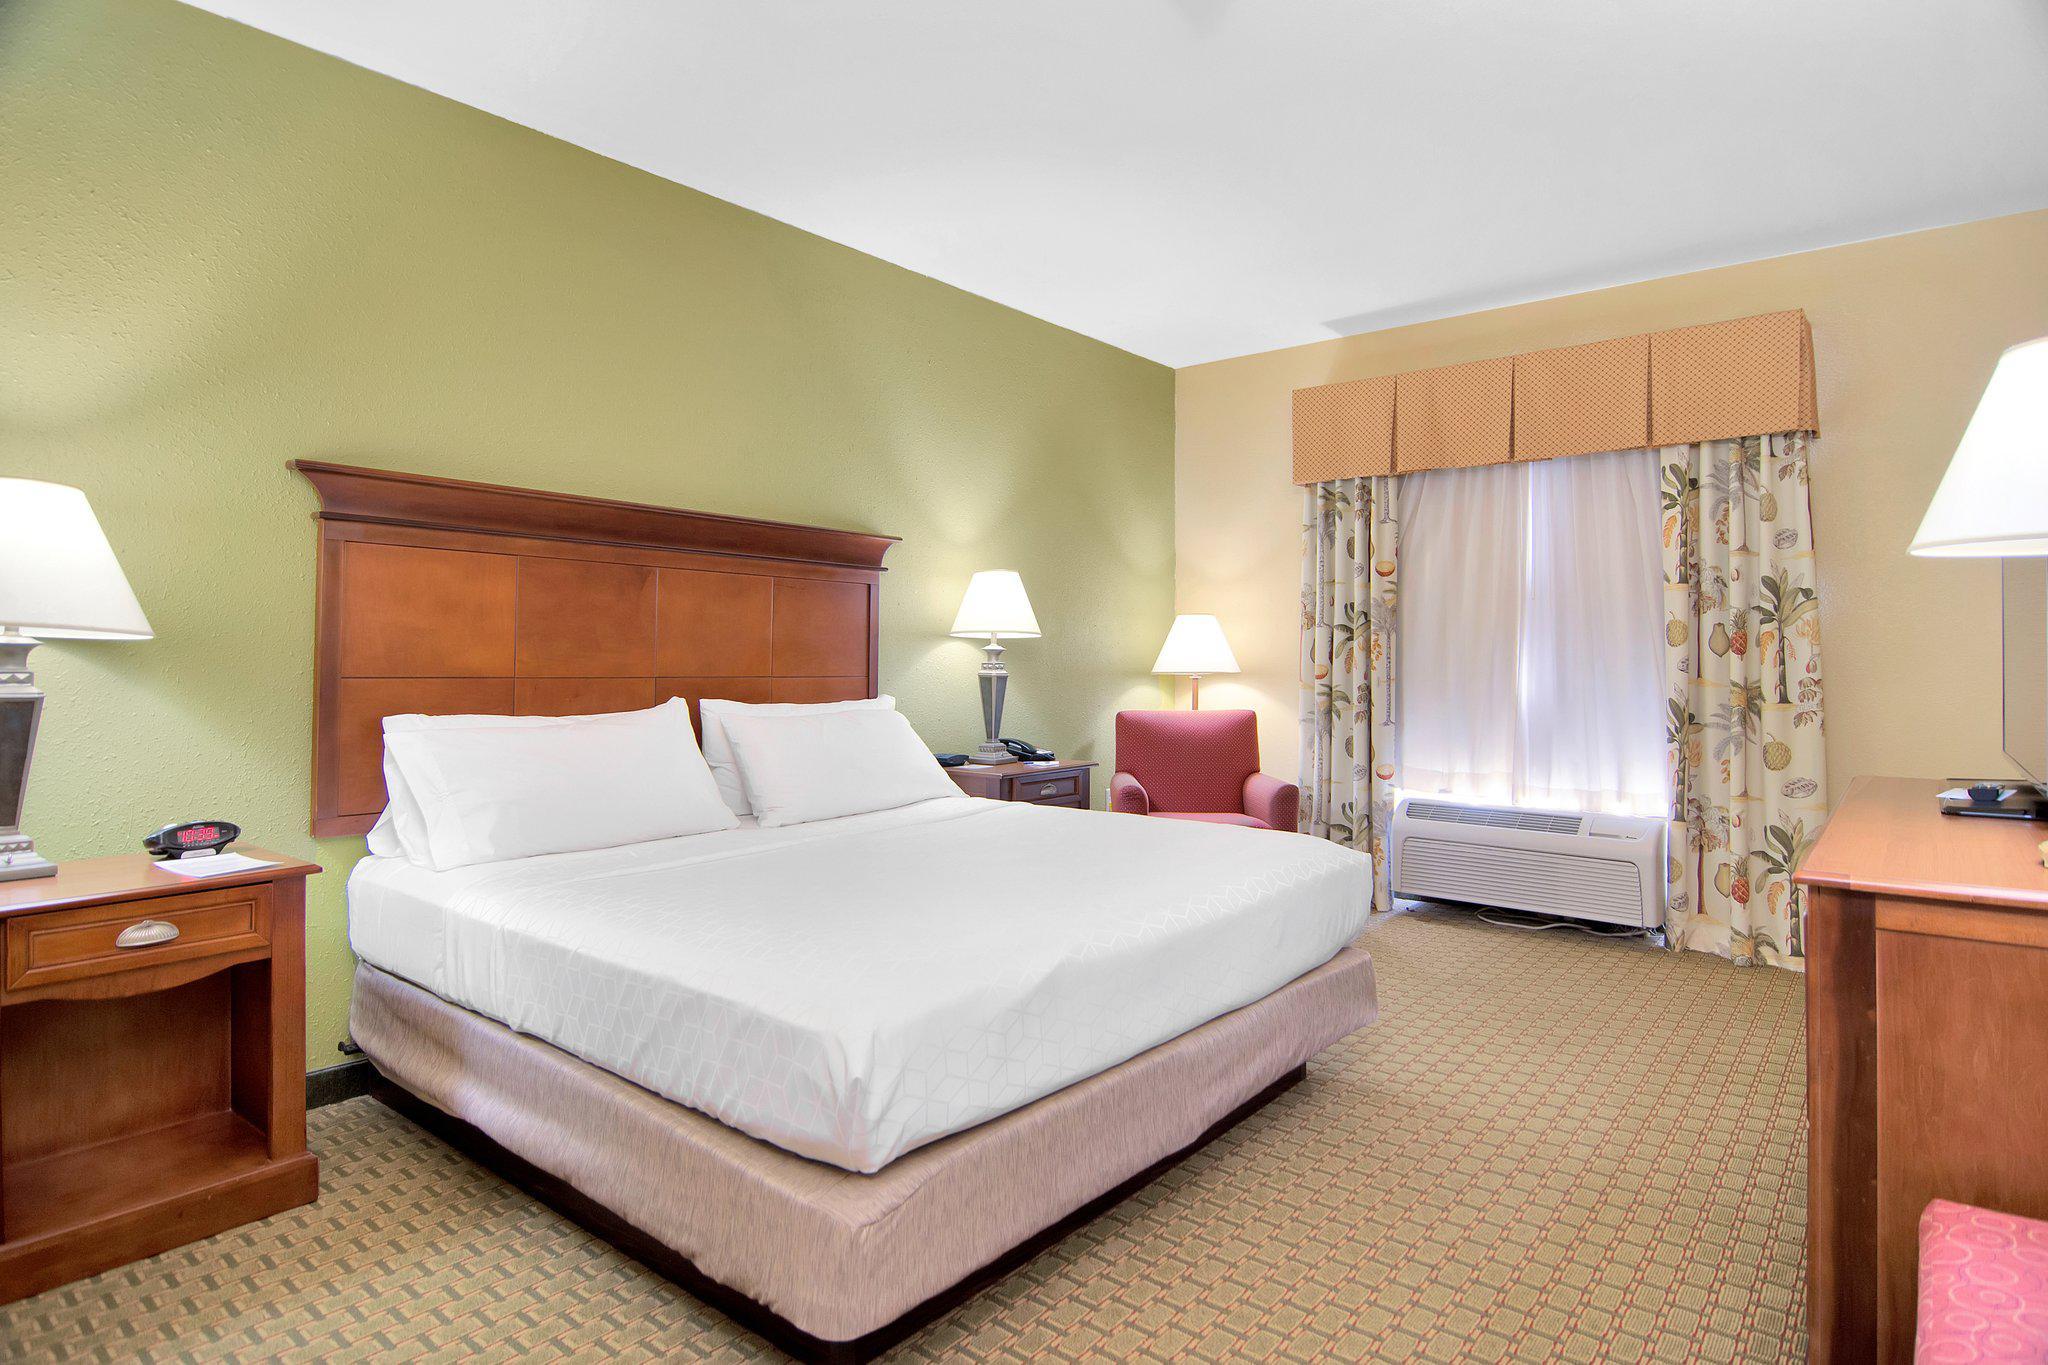 Holiday Inn Express & Suites DFW West - Hurst, an IHG Hotel